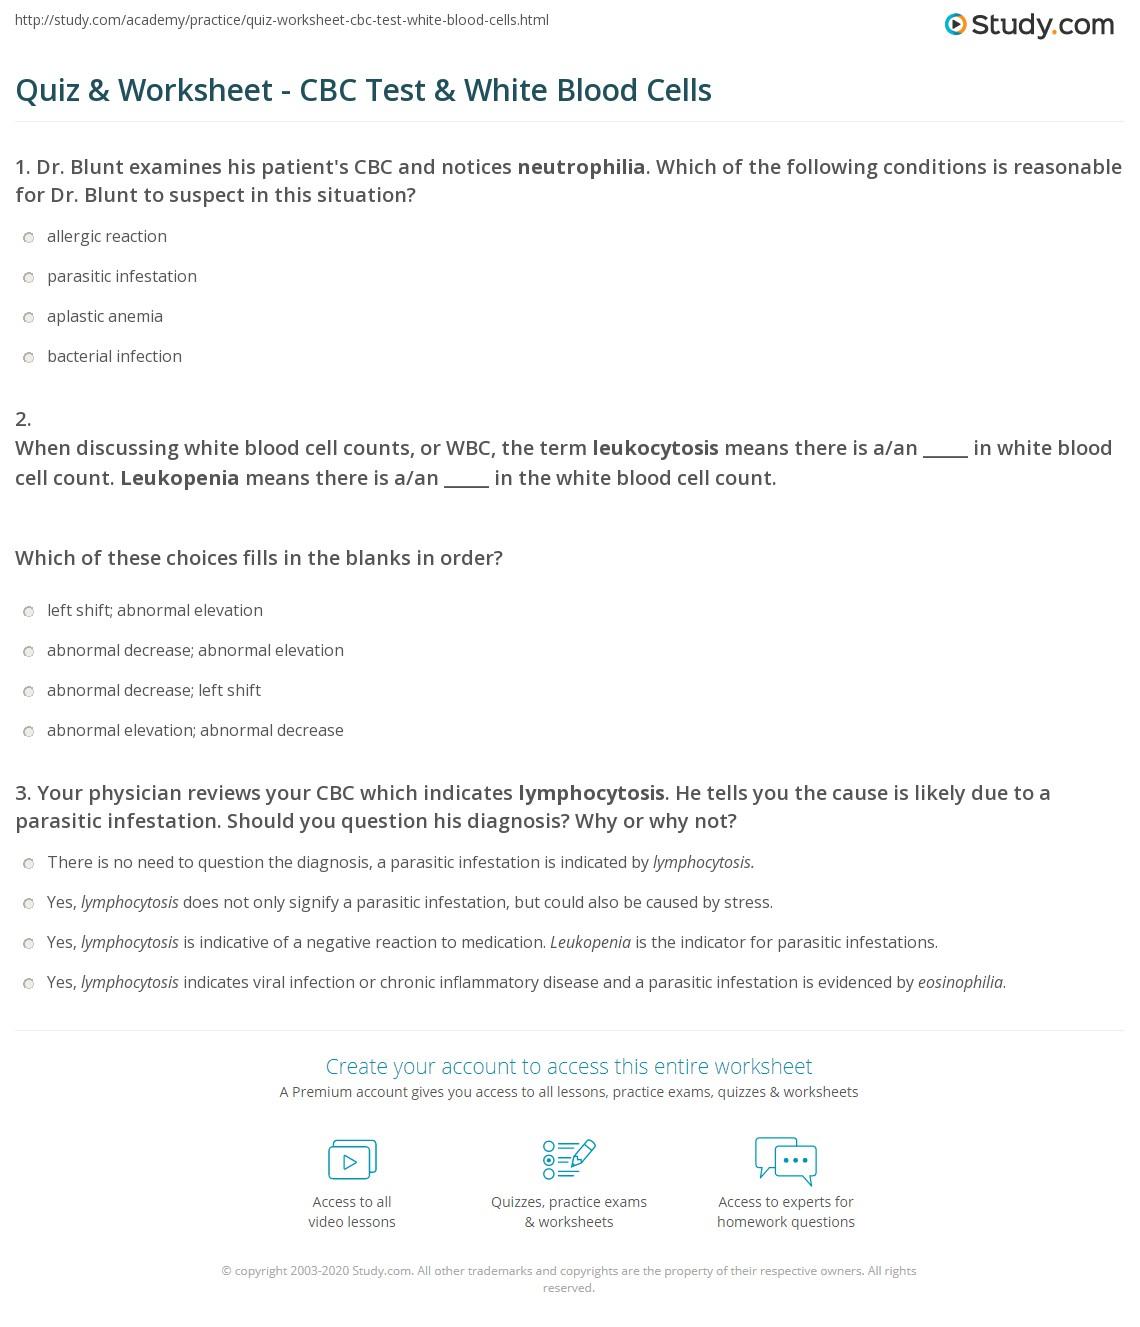 Quiz & Worksheet - CBC Test & White Blood Cells | Study.com